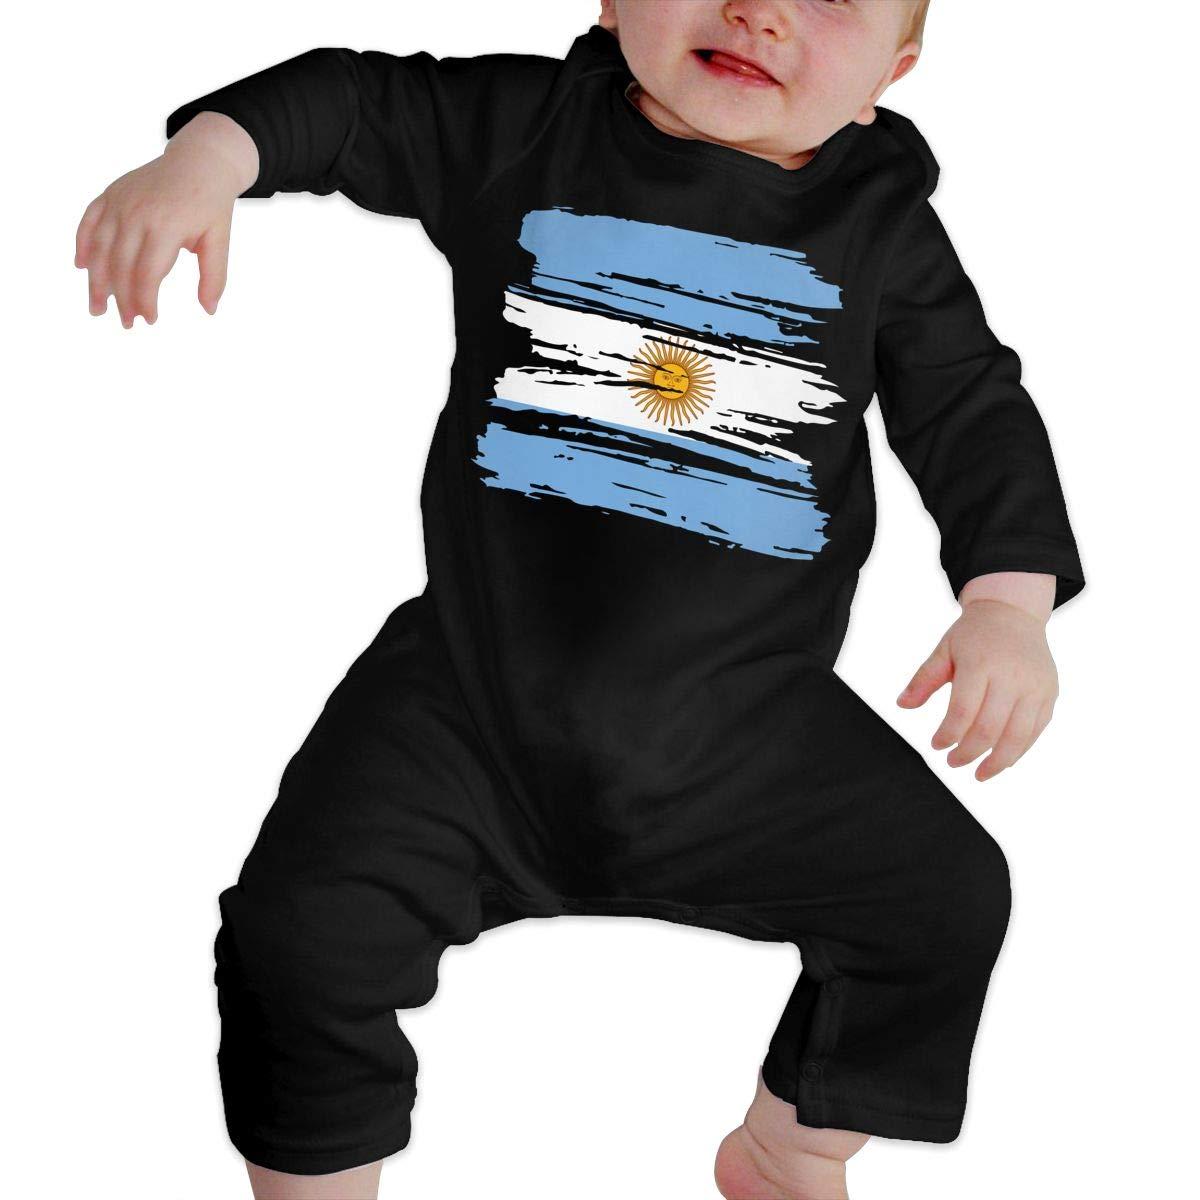 UGFGF-S3 Grunge Argentina Flag Newborn Baby Long Sleeve Romper Jumpsuit Jumpsuit